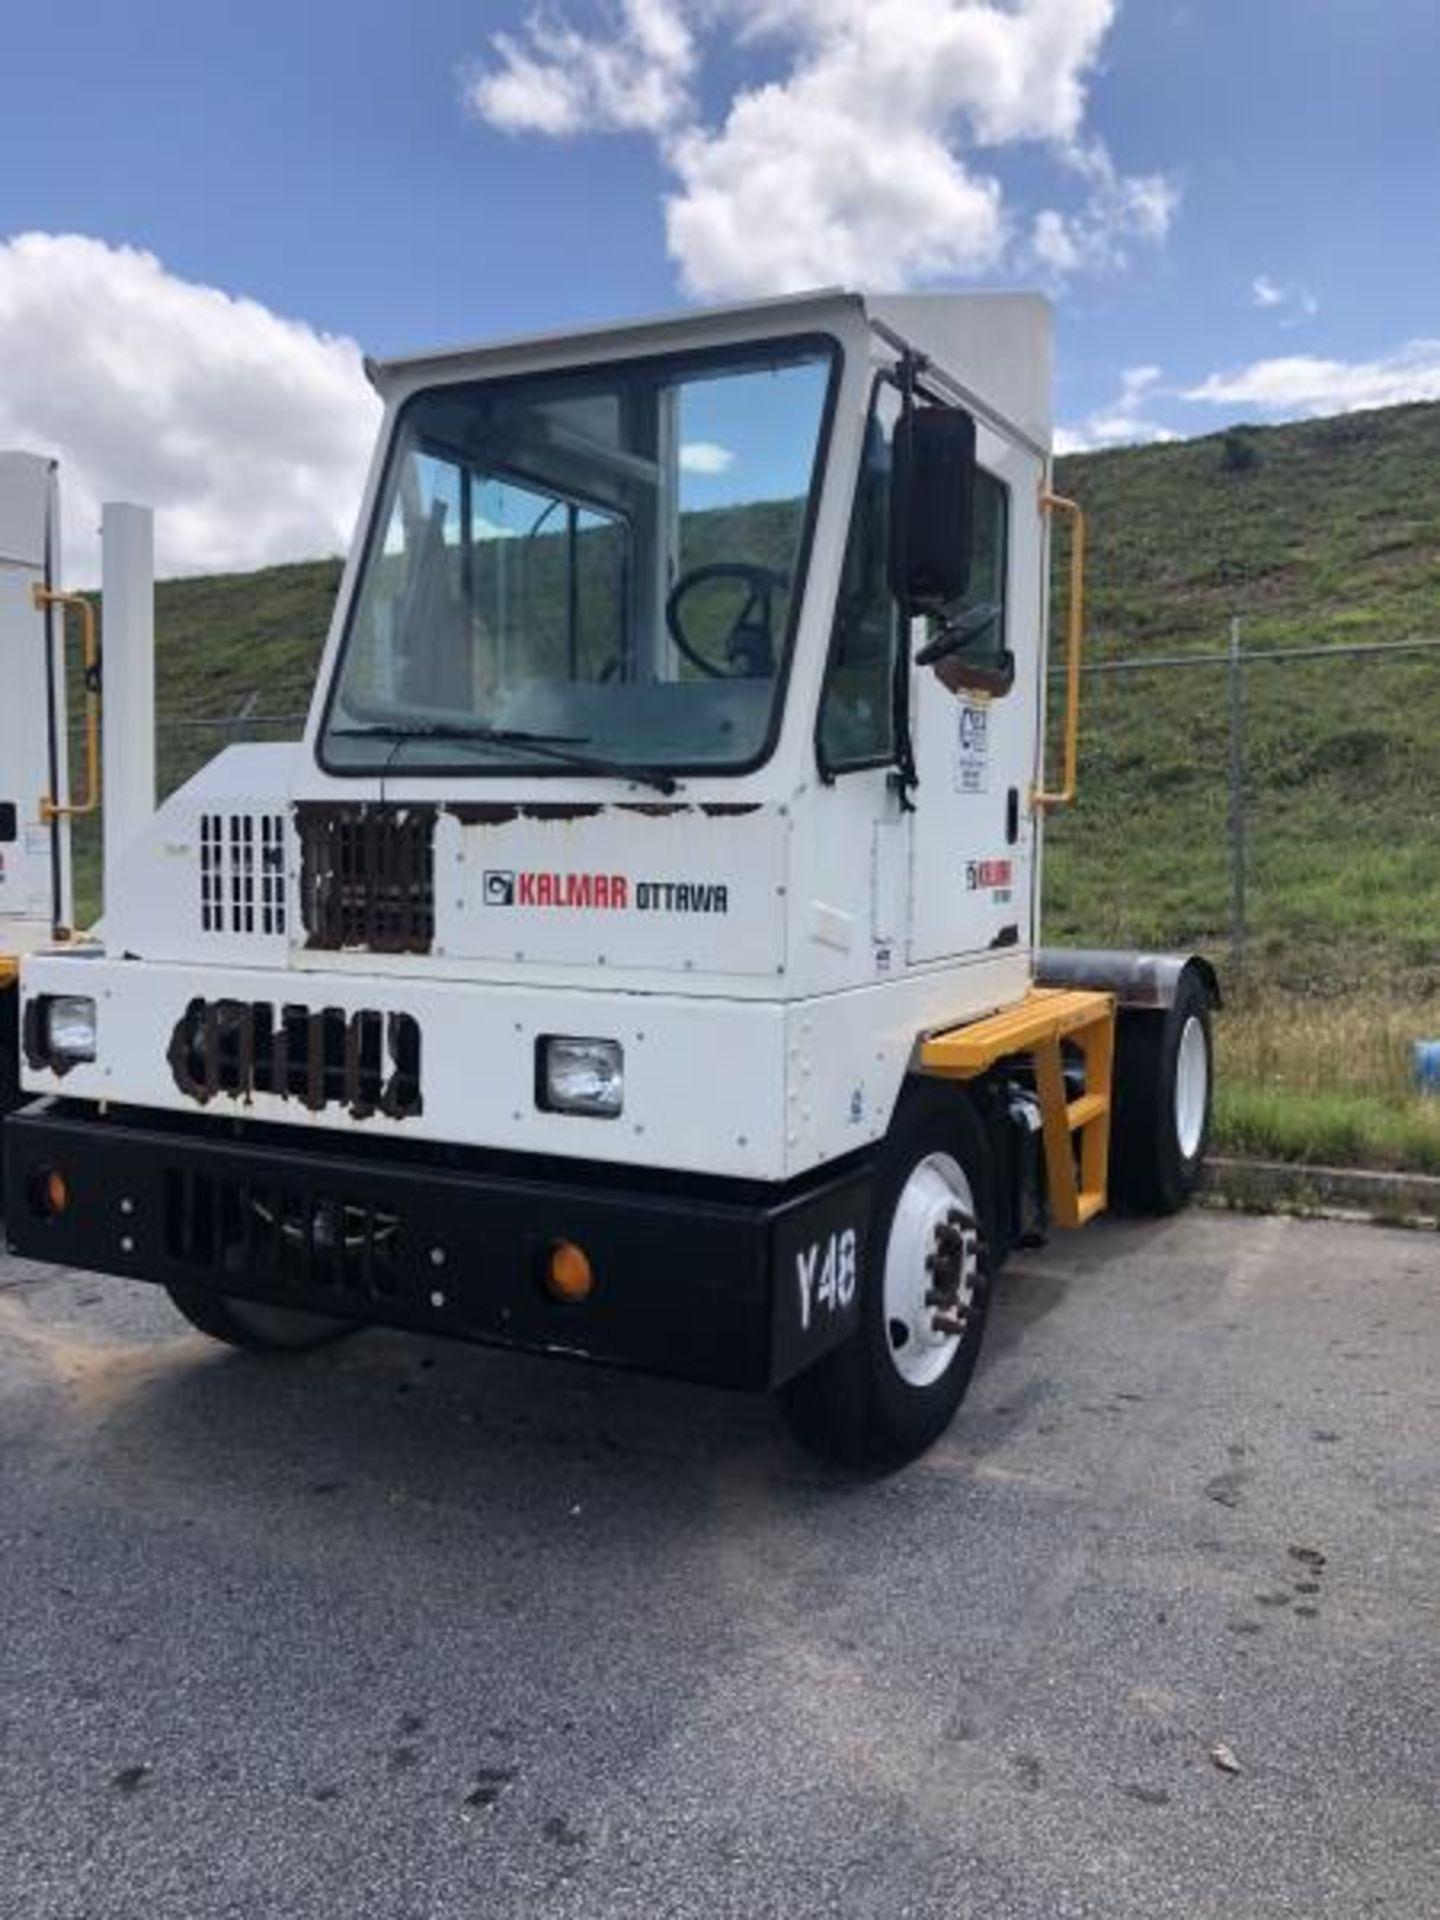 2015 Kalmar Ottawa 4x2 Yard Truck , SN: 338842 1,308.2 Hours, 937 Miles